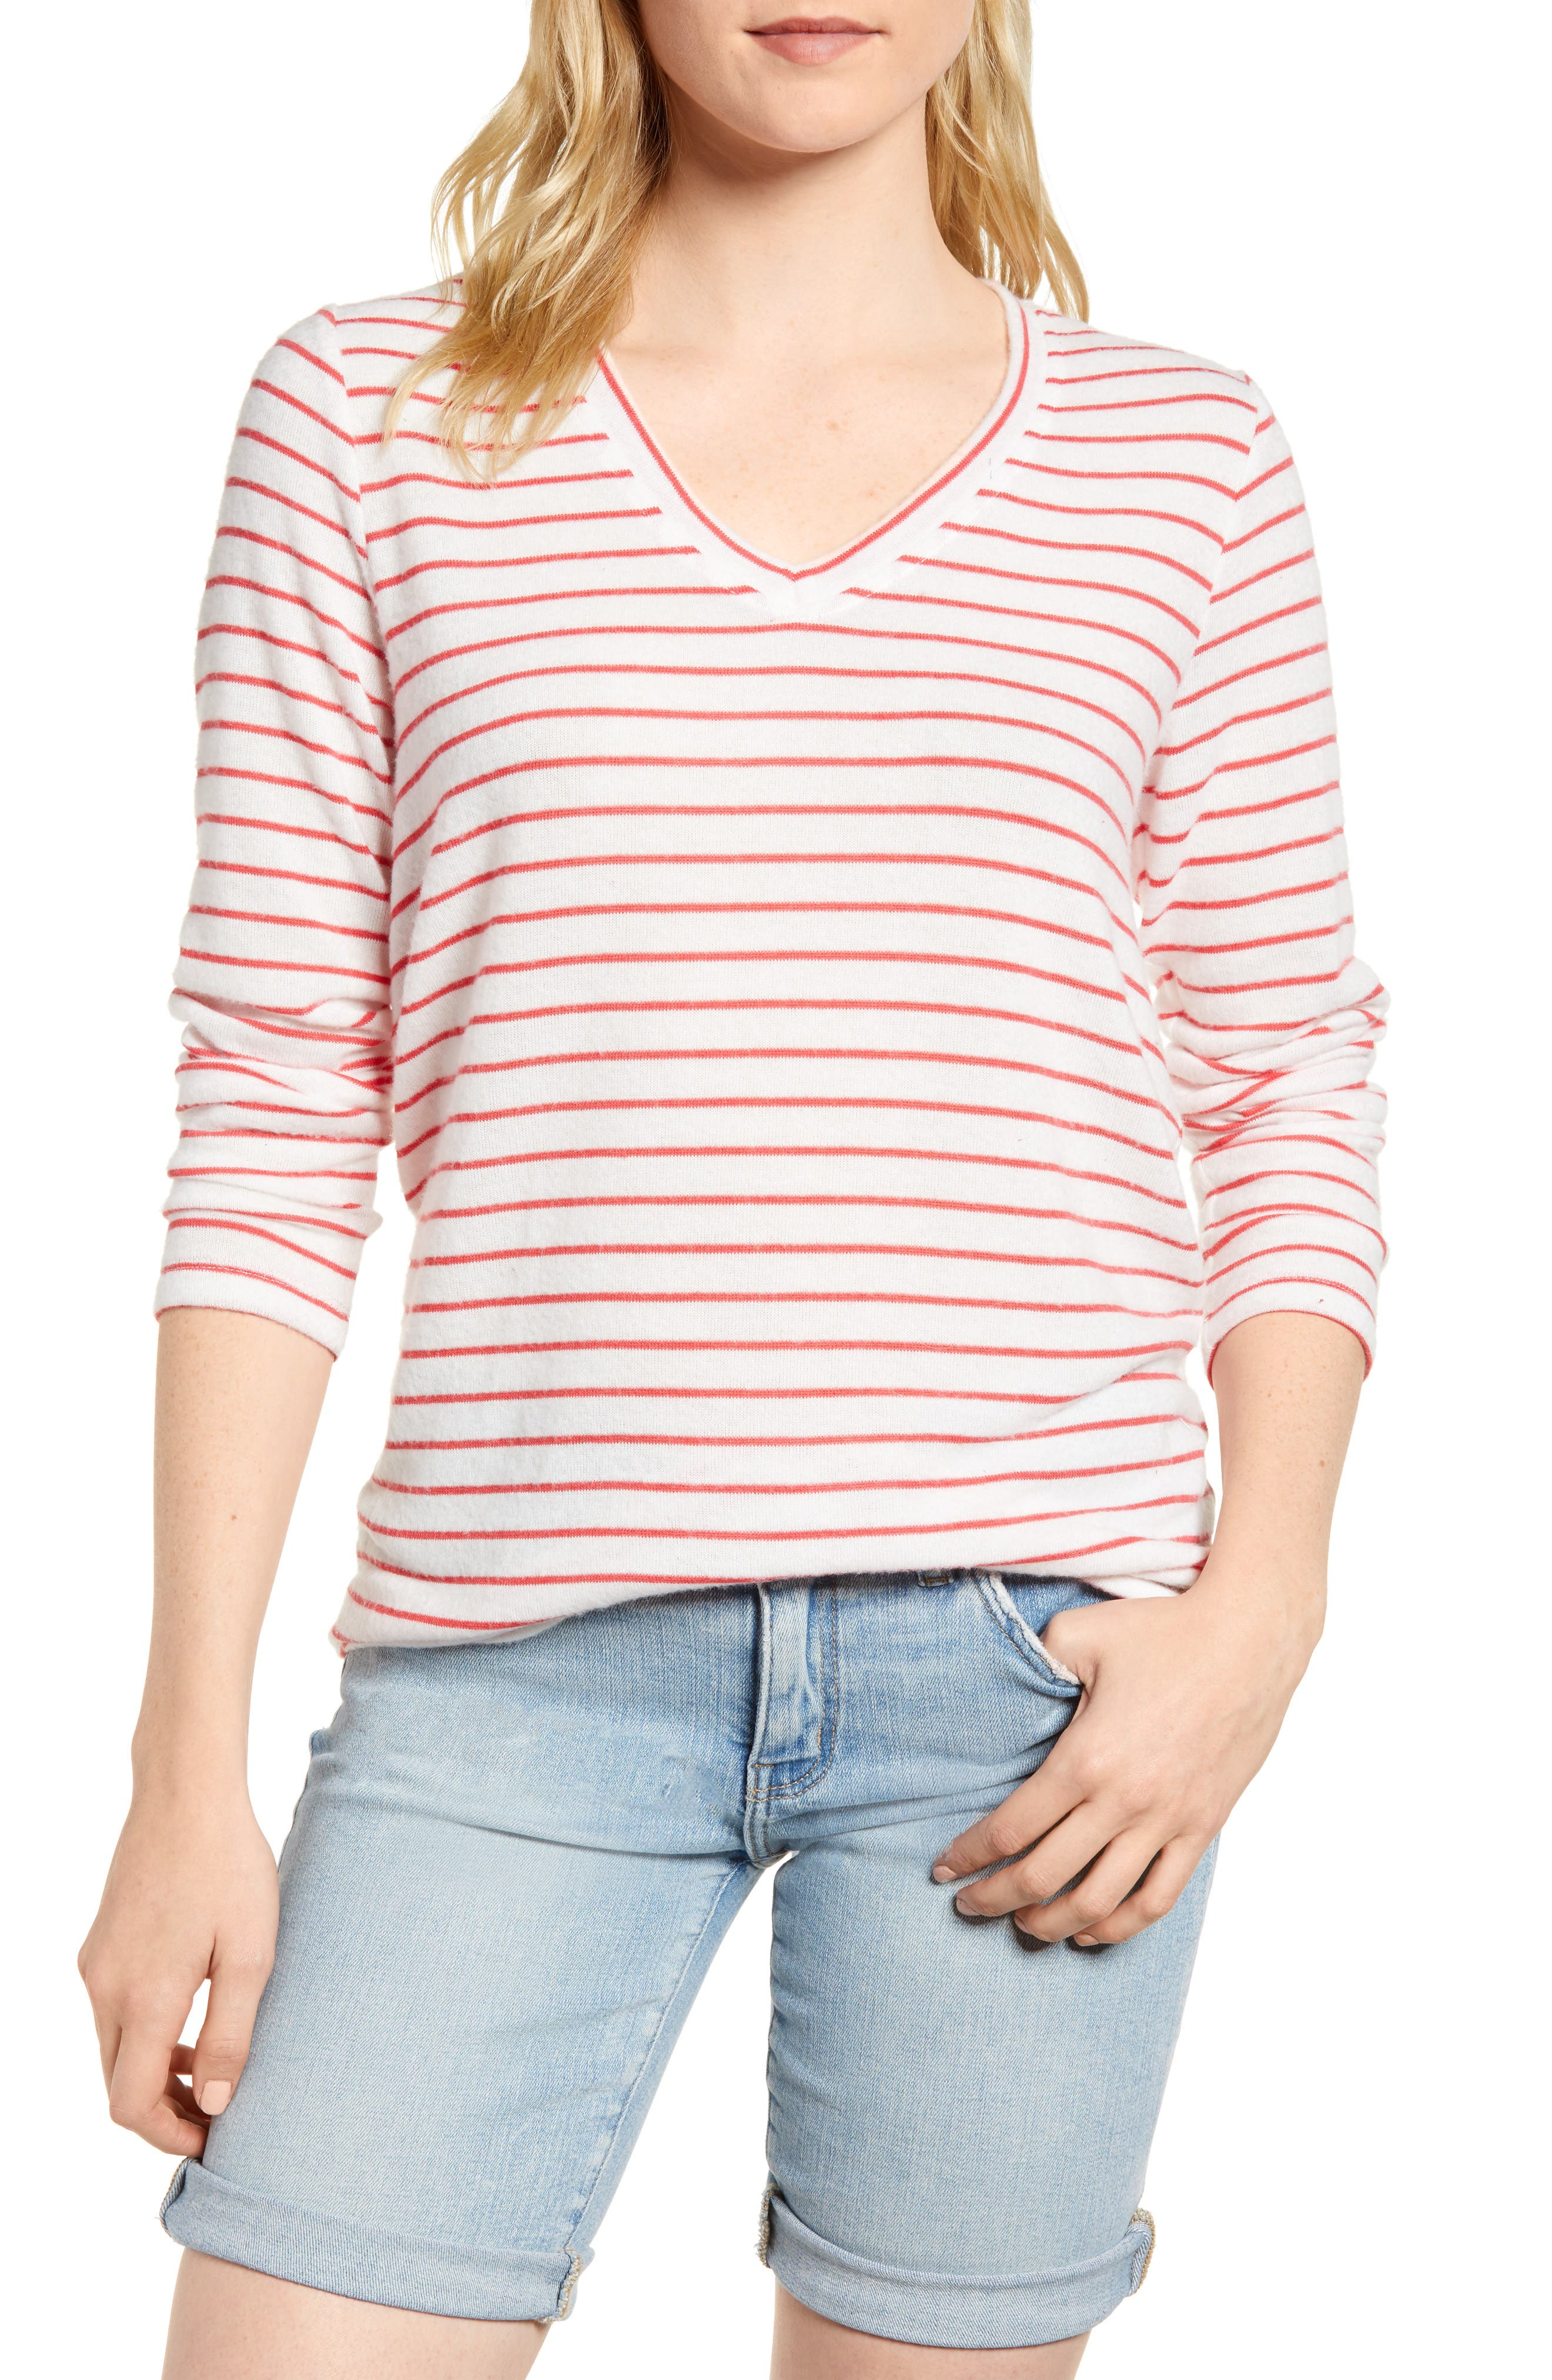 x Living in Yellow Steph Cozy Stripe Top,                         Main,                         color, Poppy/ White Stripe